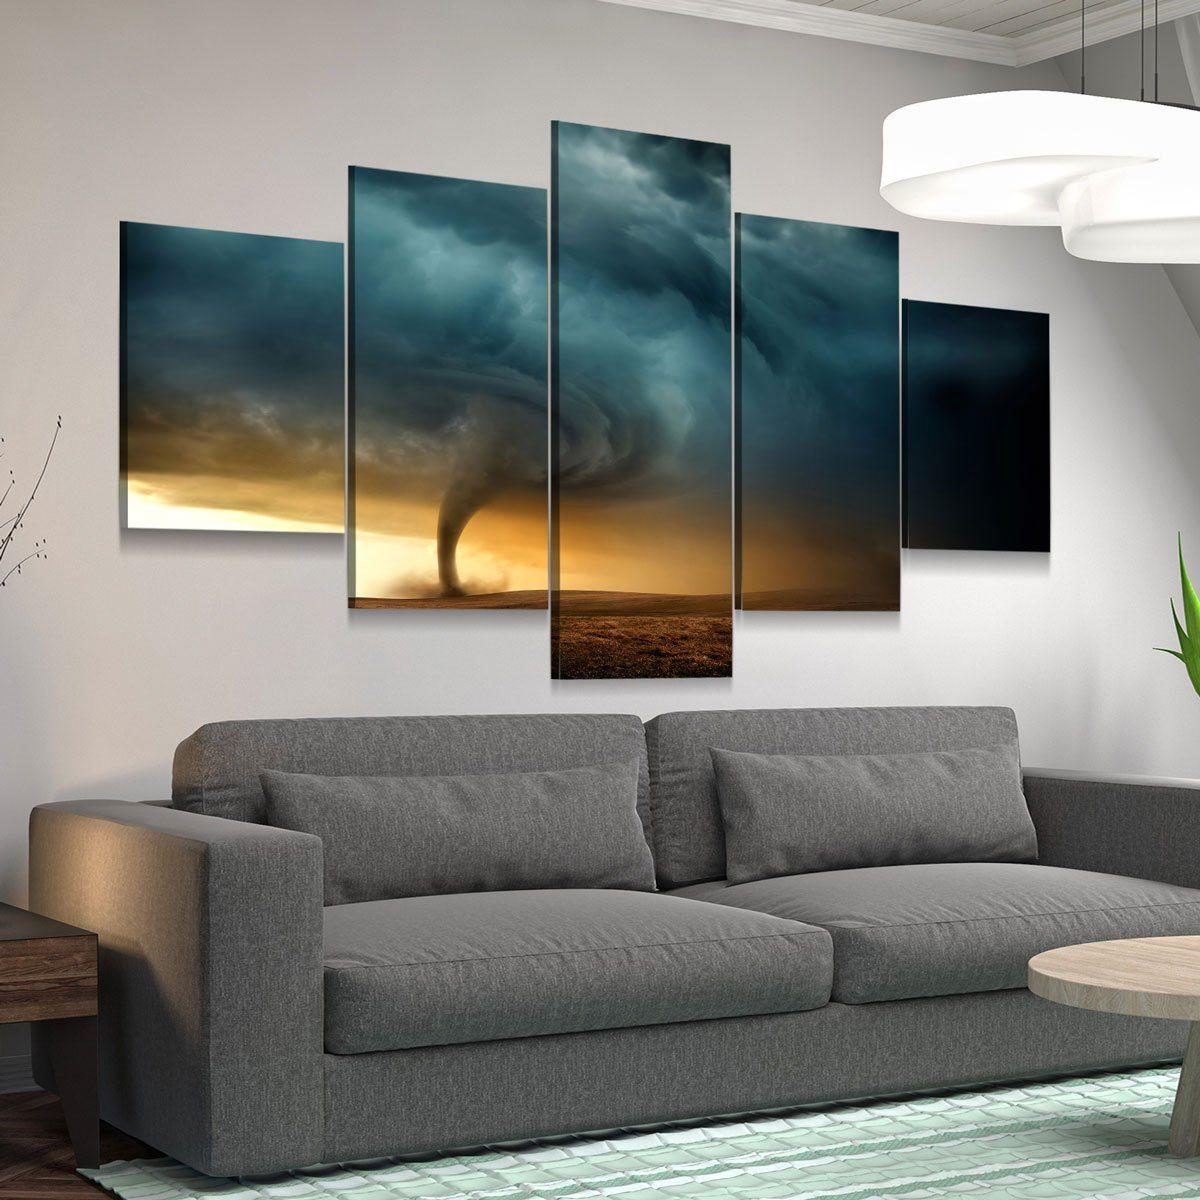 Tornado 5 panel canvas wall art